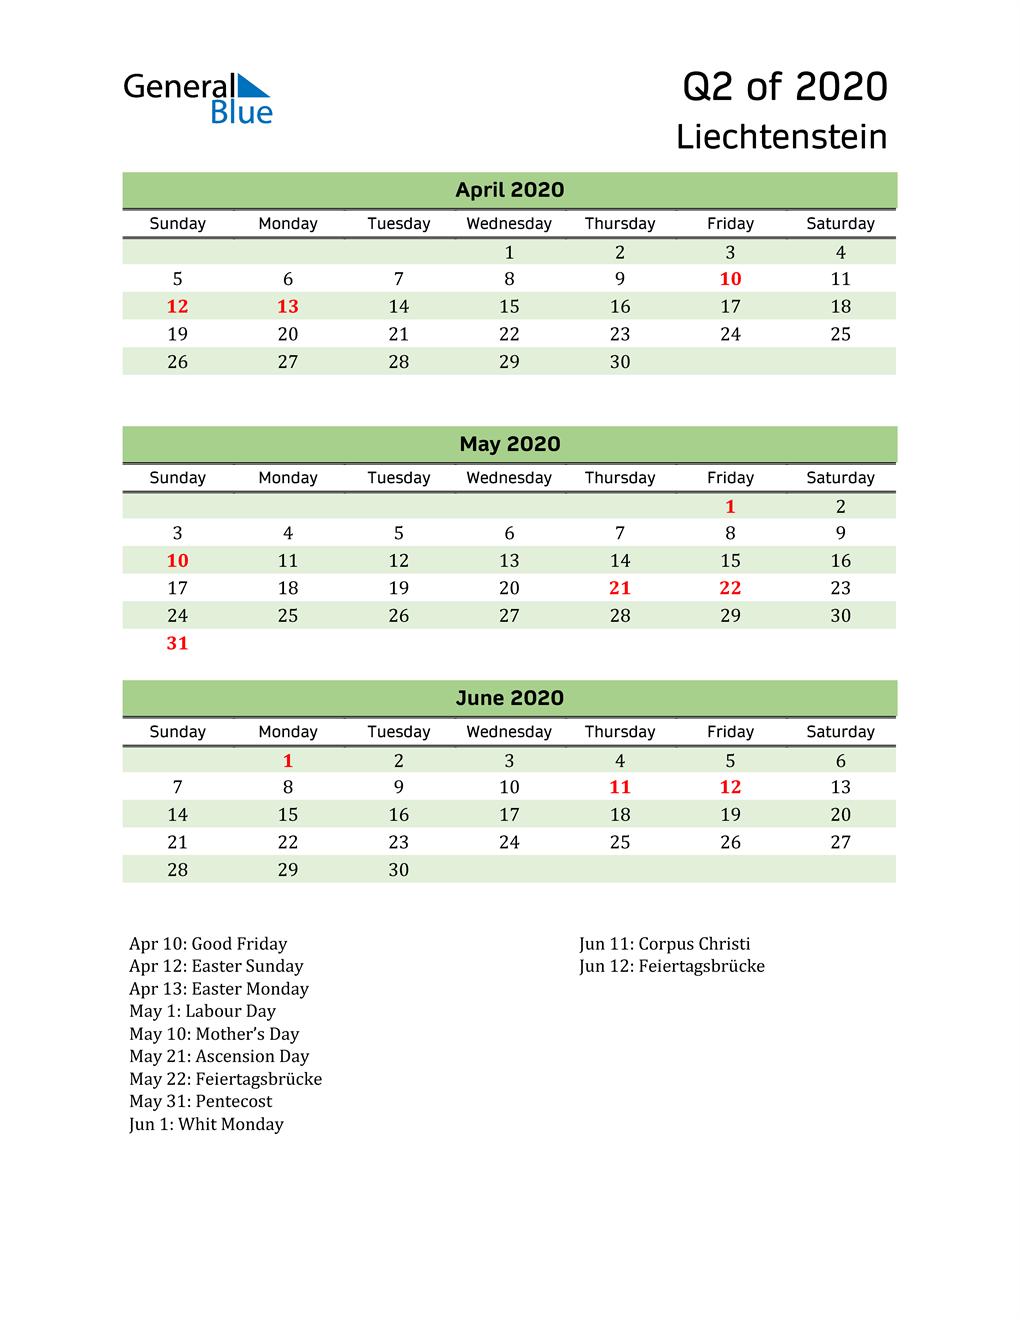 Quarterly Calendar 2020 with Liechtenstein Holidays